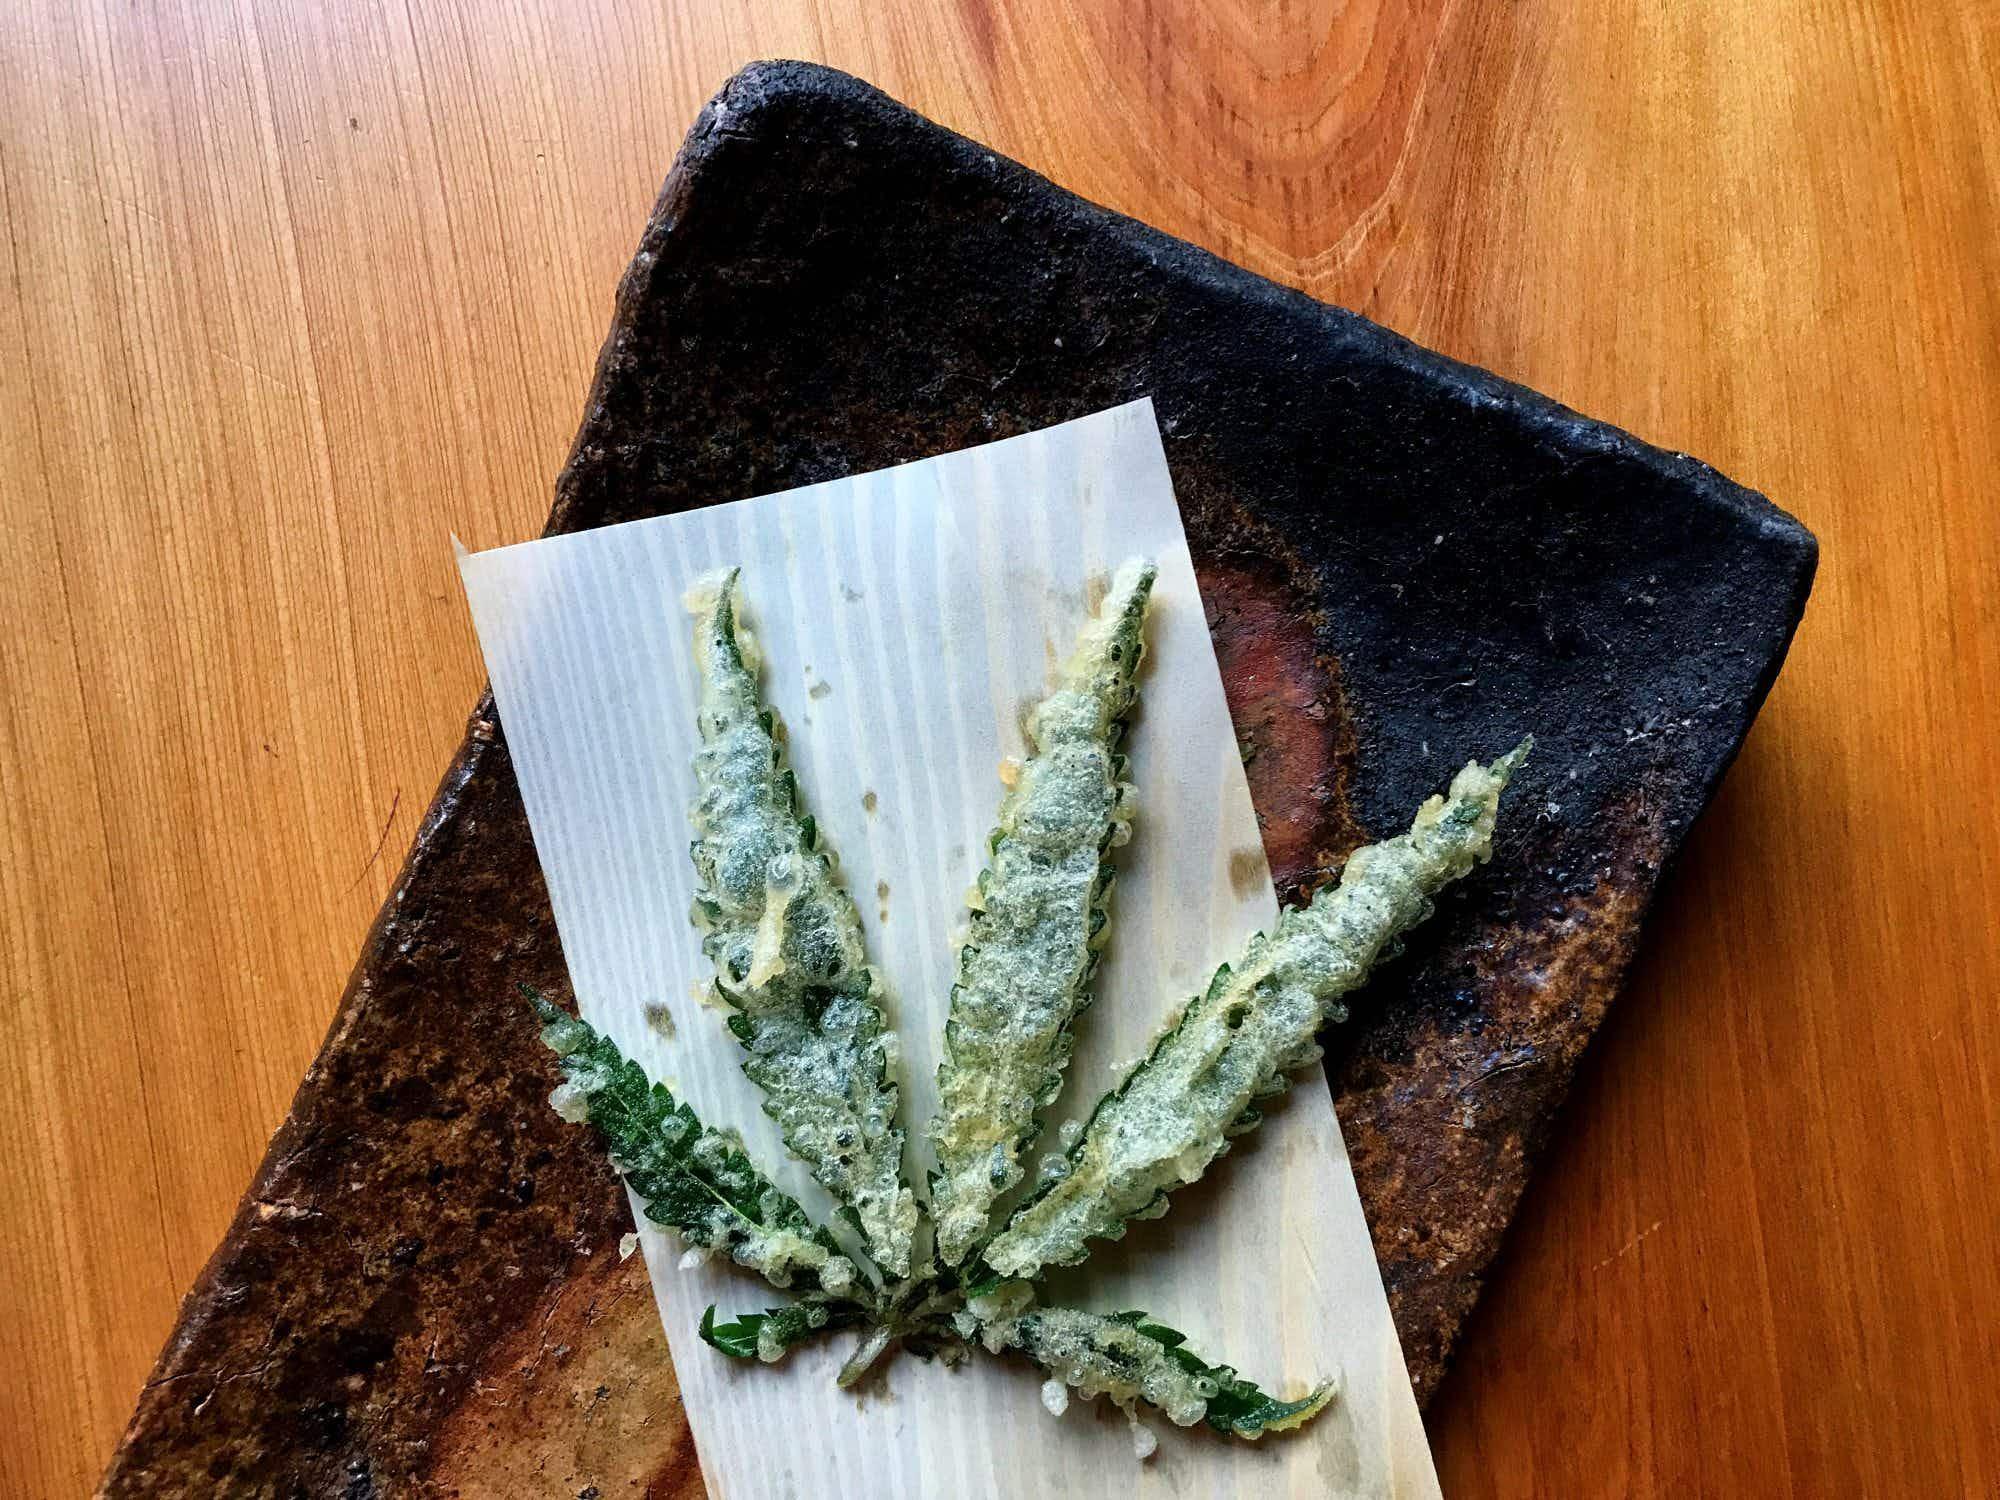 How you can order cannabis leaftempura from a secretmenu in a LA restaurant